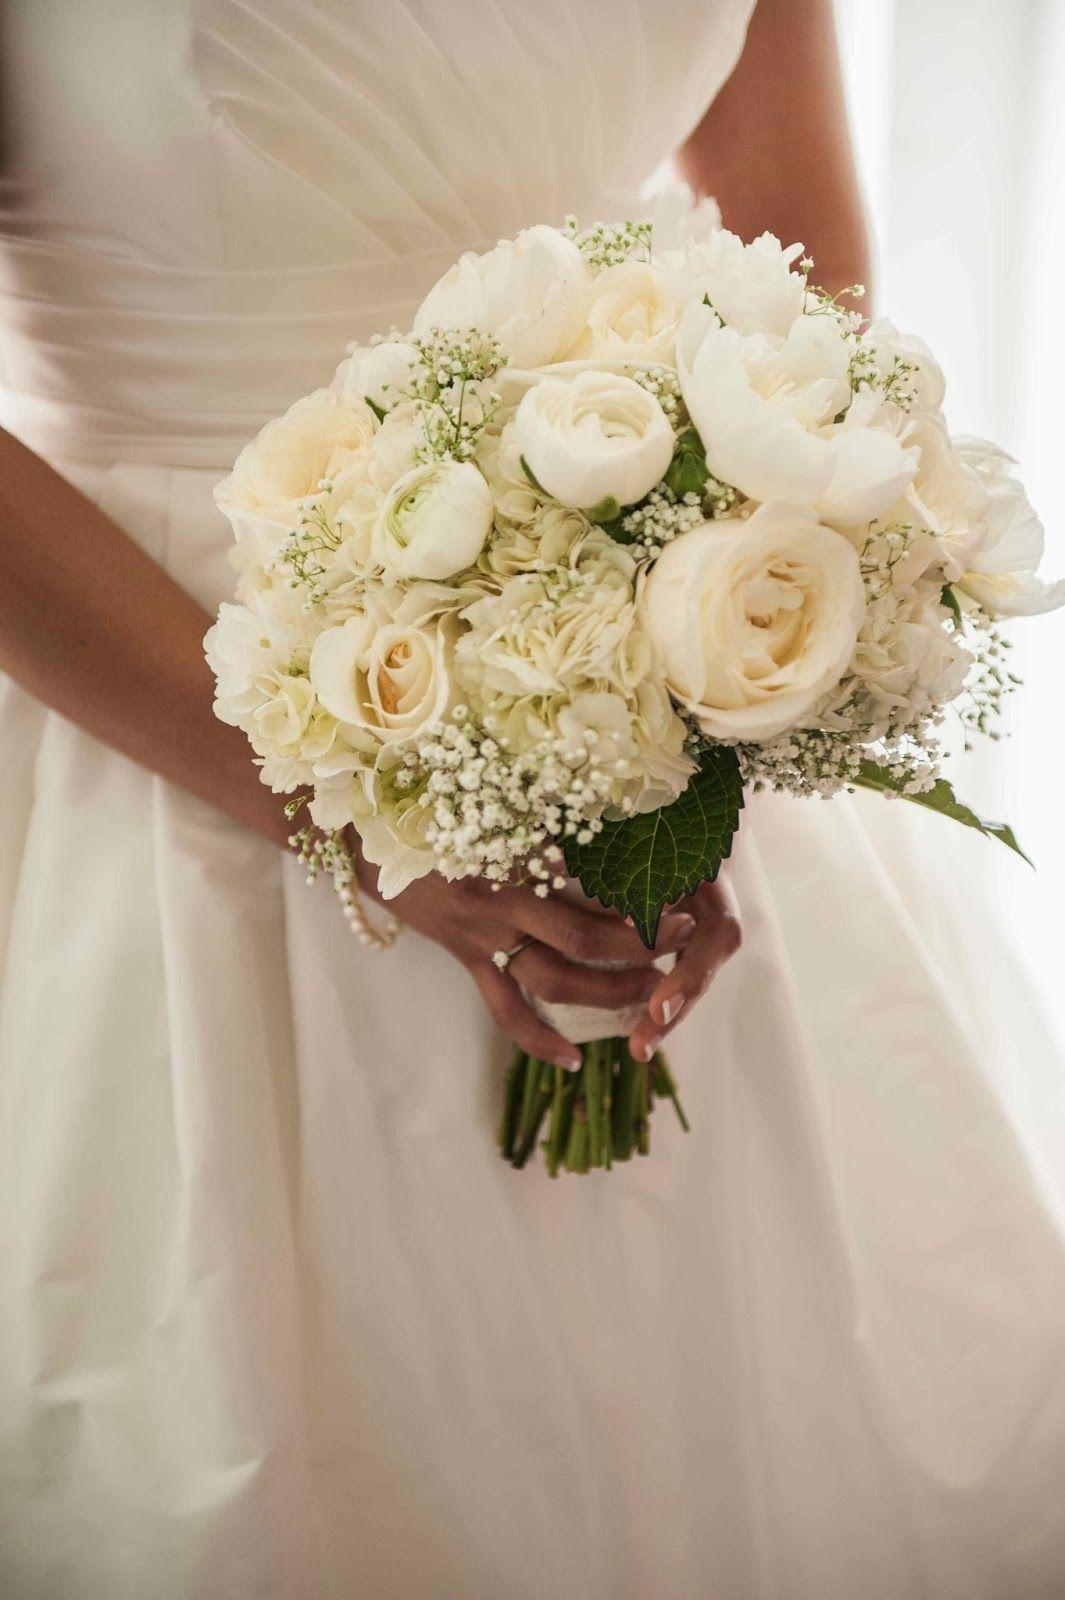 Peonie Bouquet Da Sposa.An All White Bridal Bouquet Featuring Babies Breath Peony